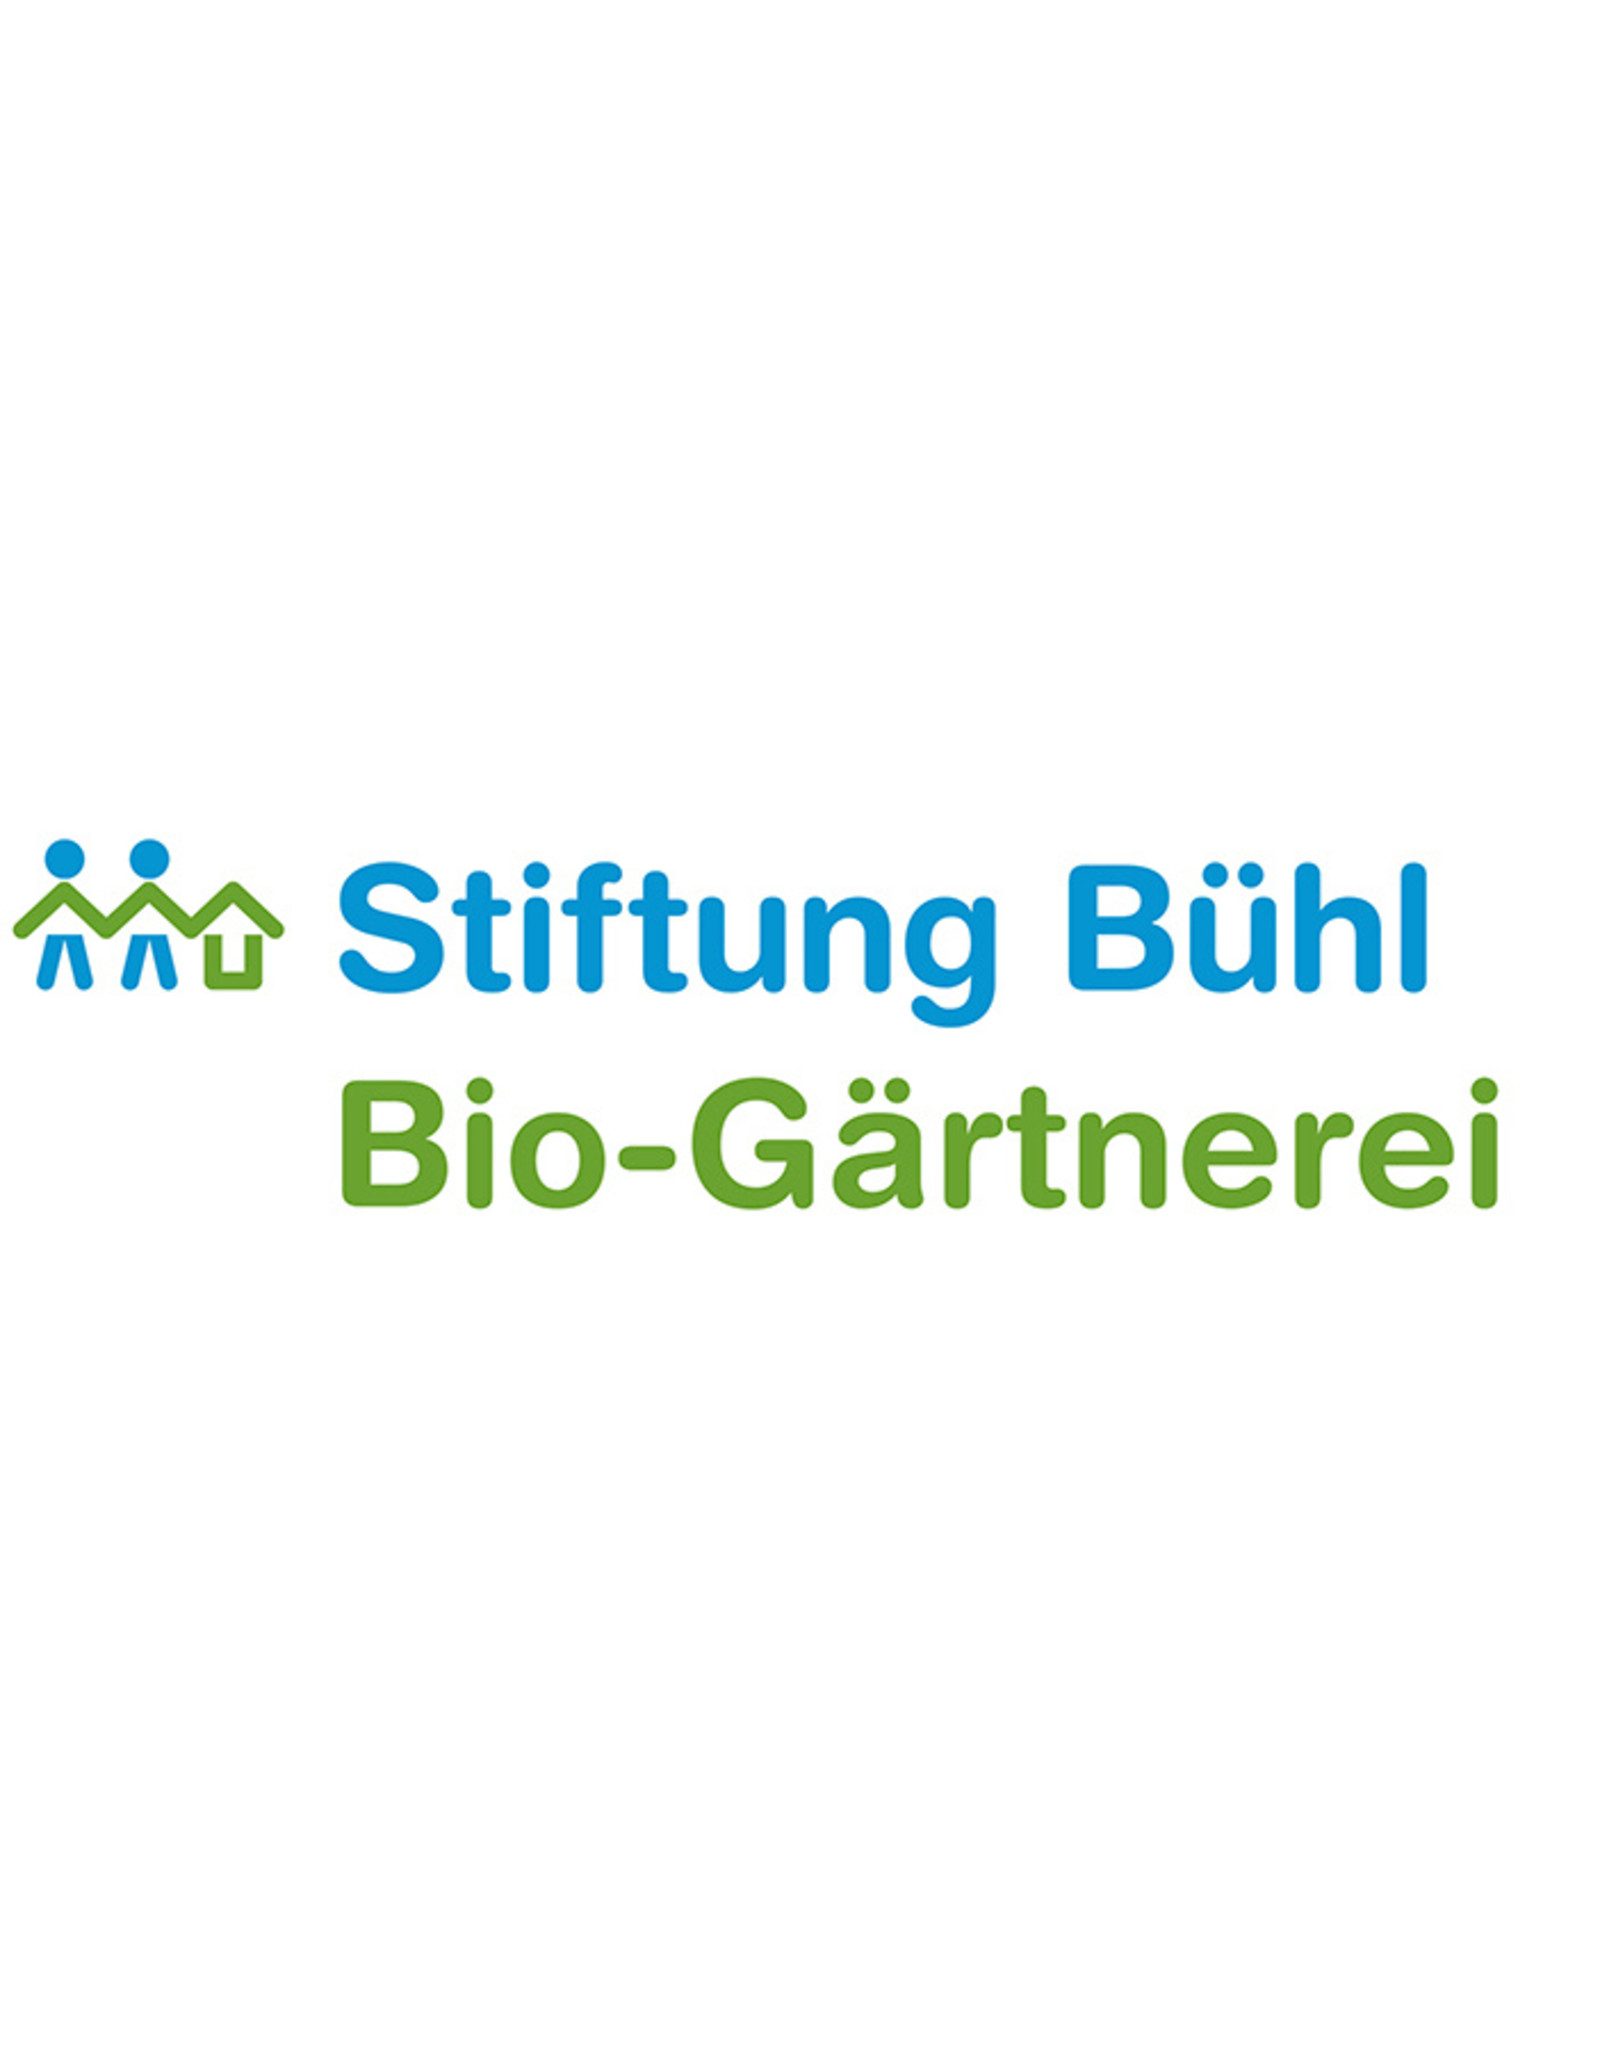 Hausmarke Stiftung Bühl Kräutersalz Morgenröte 100 g Streuer